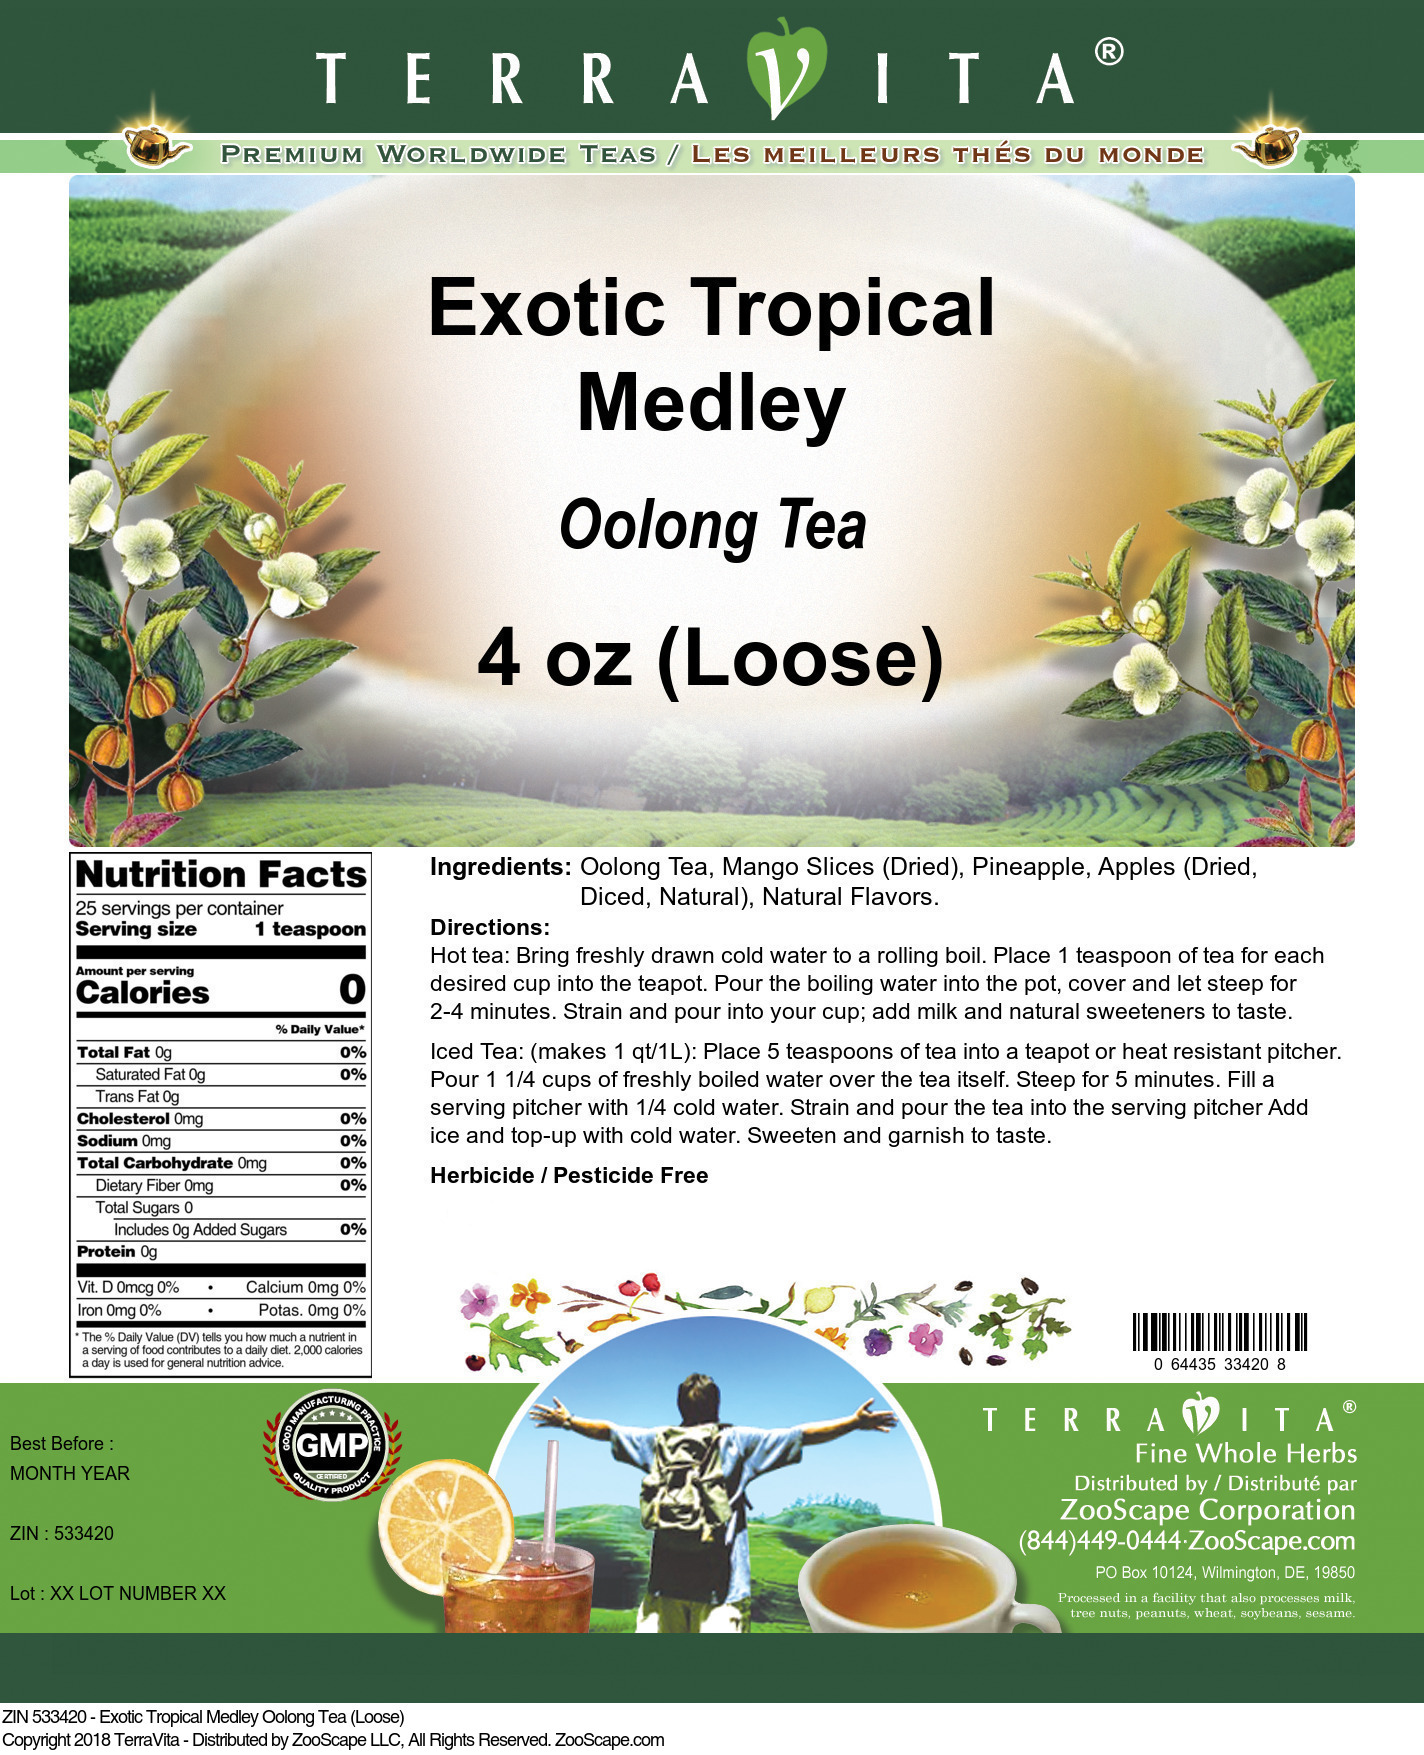 Exotic Tropical Medley Oolong Tea